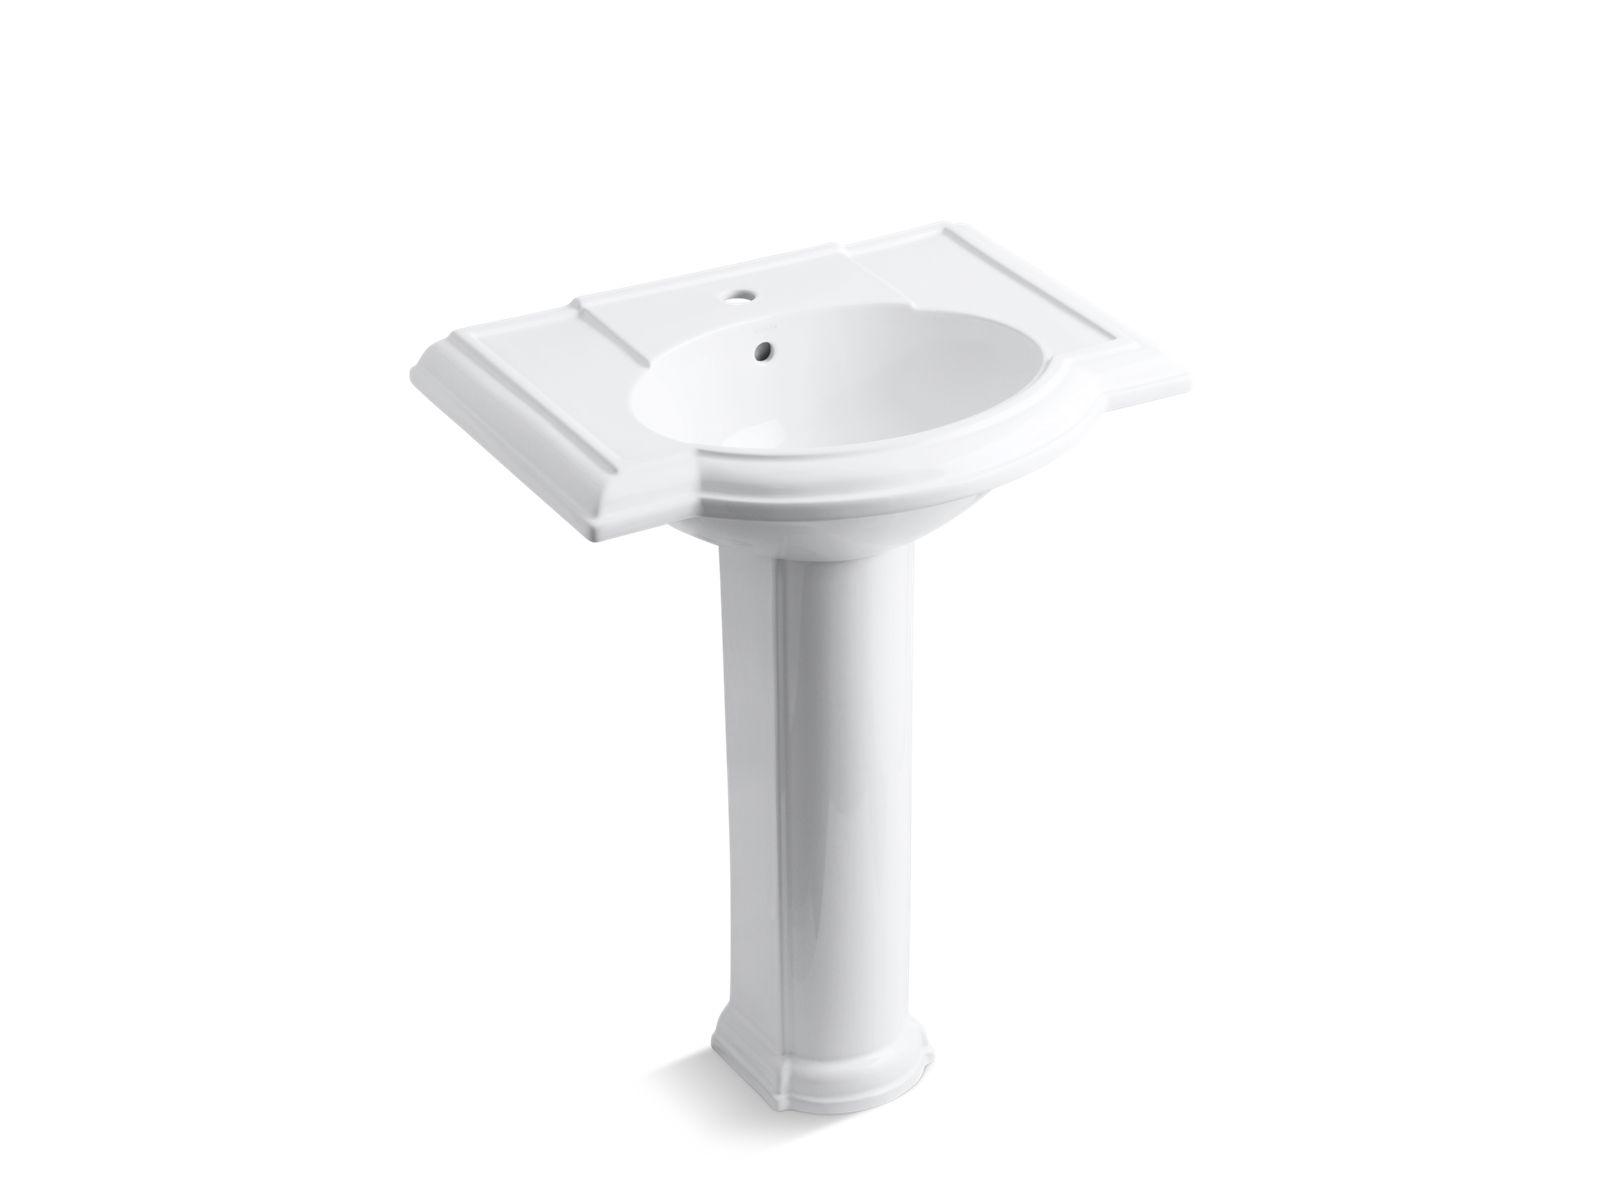 Attrayant Devonshire Pedestal Sink With Single Faucet Hole | K 2294 1 | KOHLER